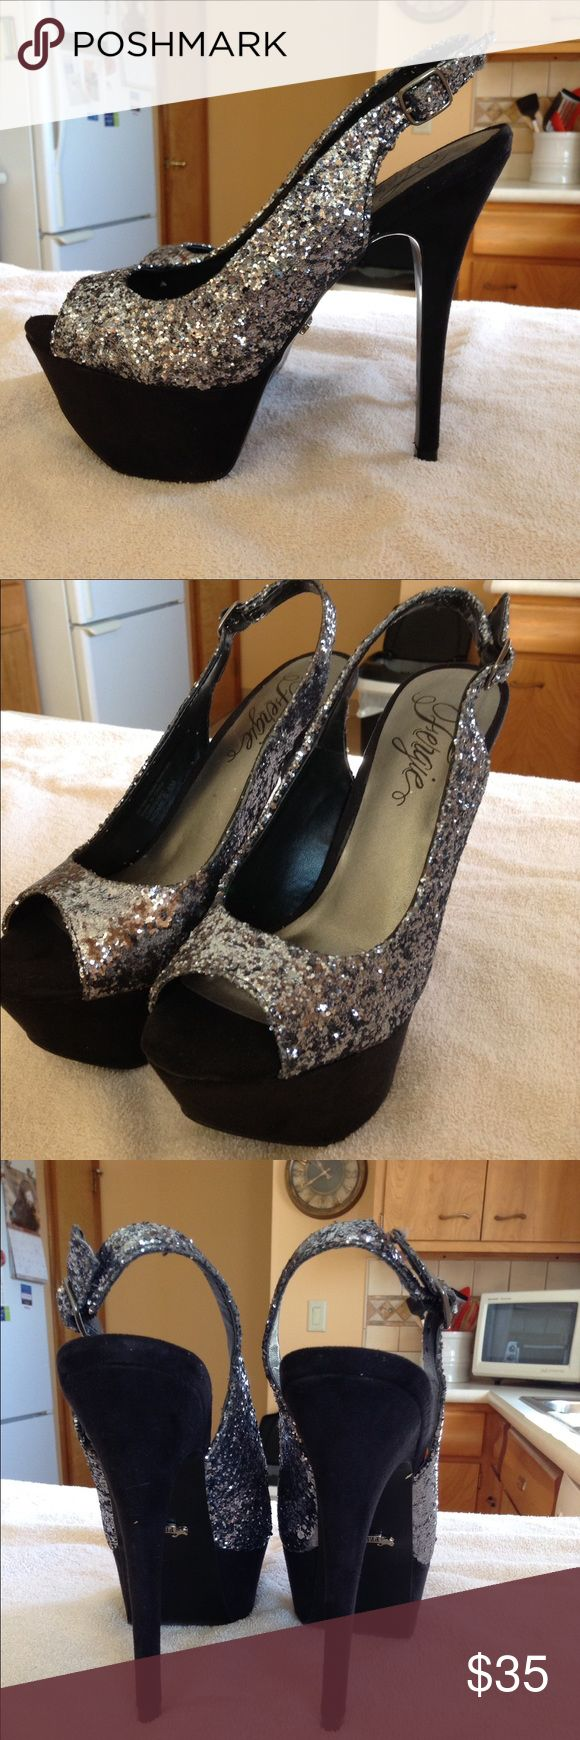 Fergie glitter heels Sexy, glittery, head turning heels. Heel is 5 inches. Worn once. Fergie Shoes Heels